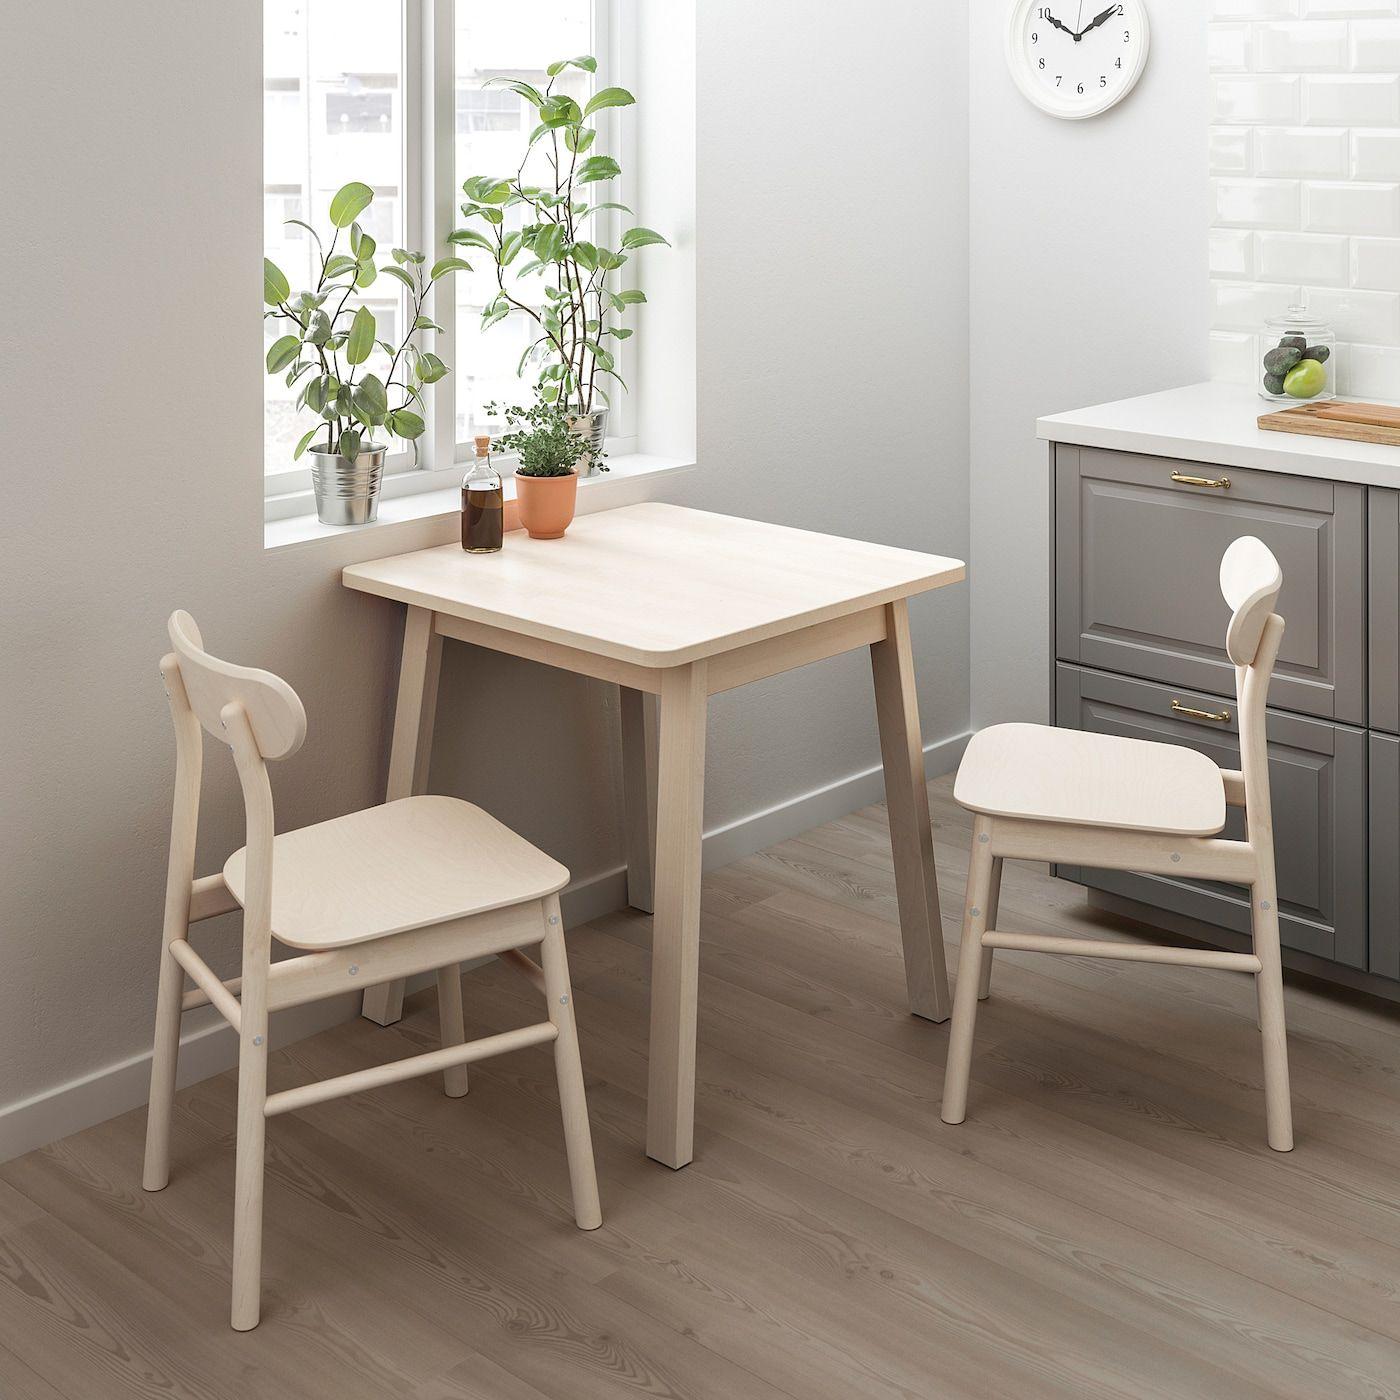 IKEA NORRAKER Birch Table Small kitchen tables, Ikea, Table